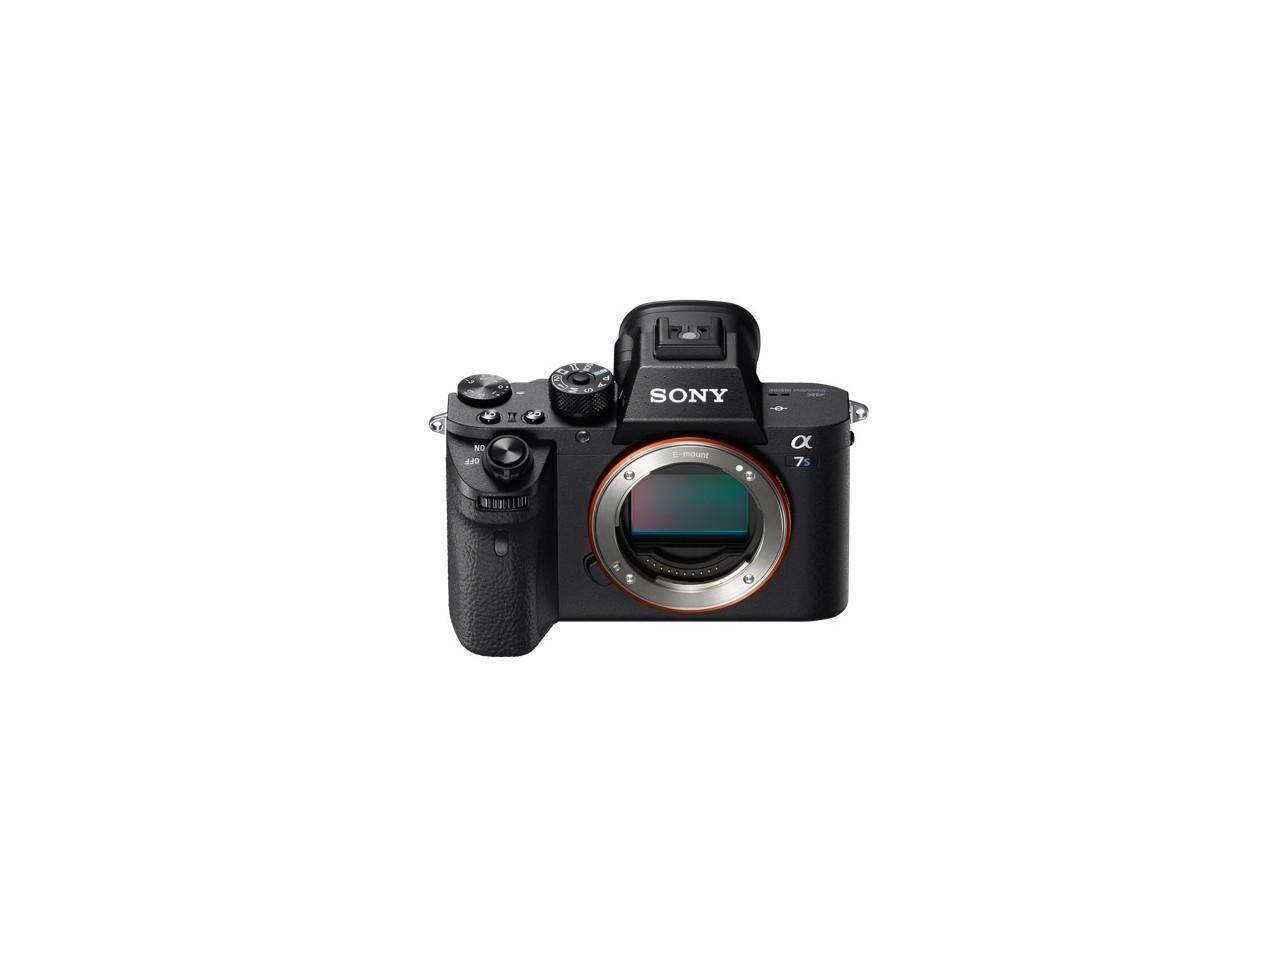 Sony Alpha ILCE-7SM2 купить в интернет-магазине Sony Centre Воронеж